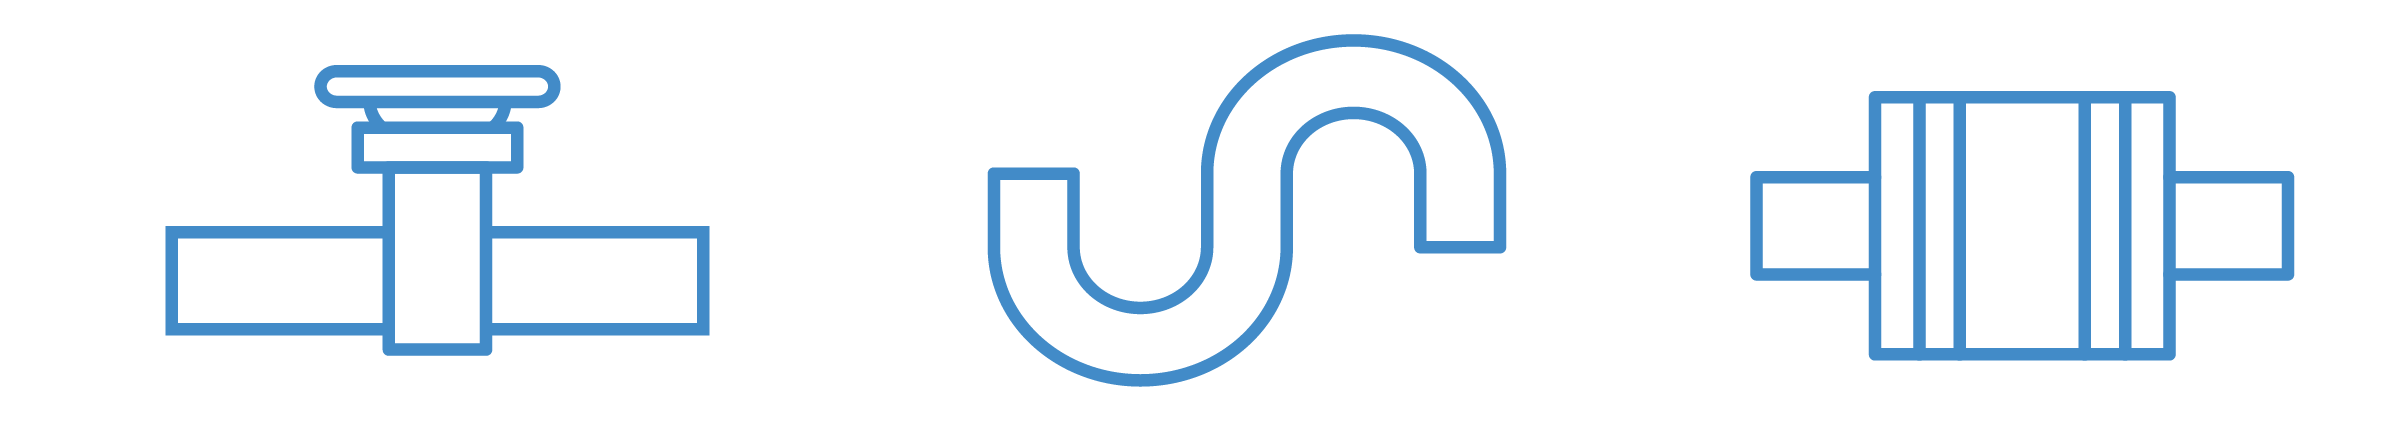 ikona elementy wodociągu